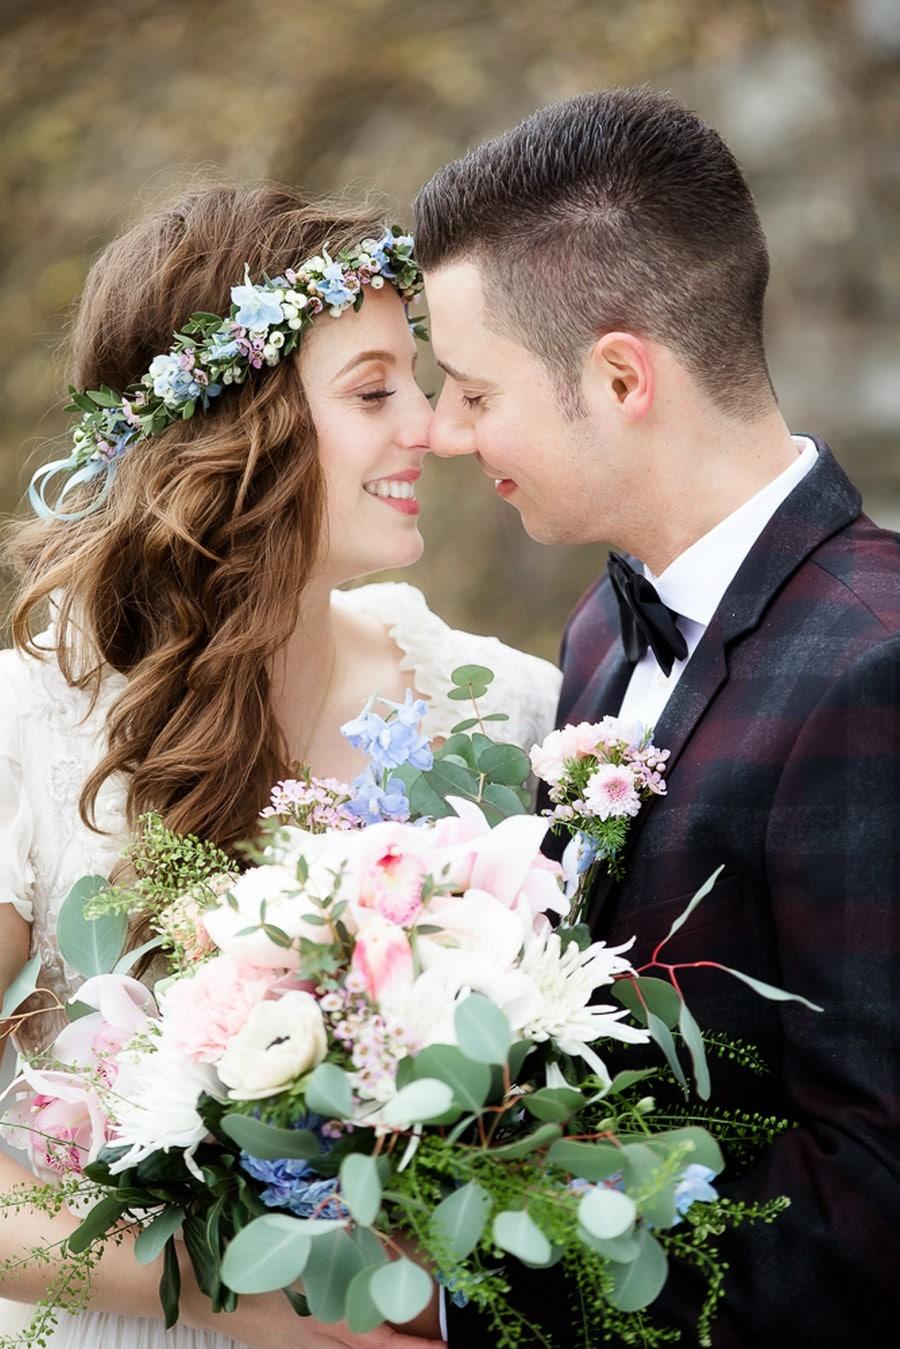 Boho Braut mit Bräutigam in Retro-Anzug